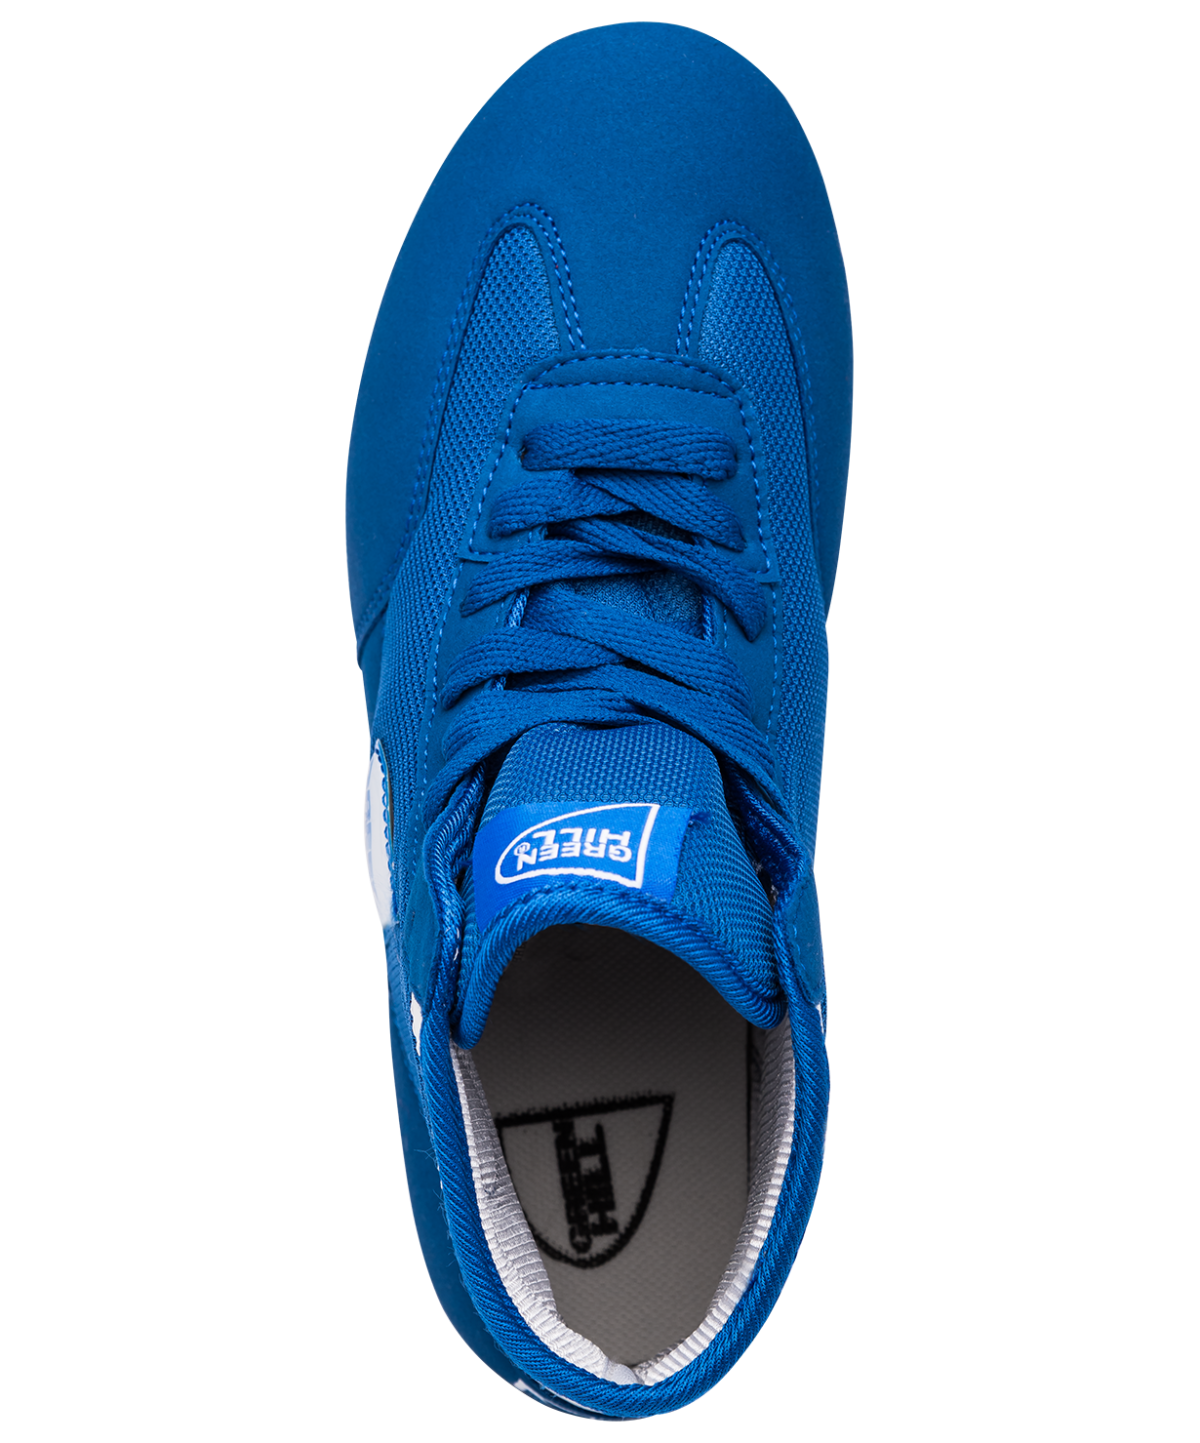 GREEN HILL Обувь для борьбы  GWB-3052/GWB-3055: синий/белый - 2